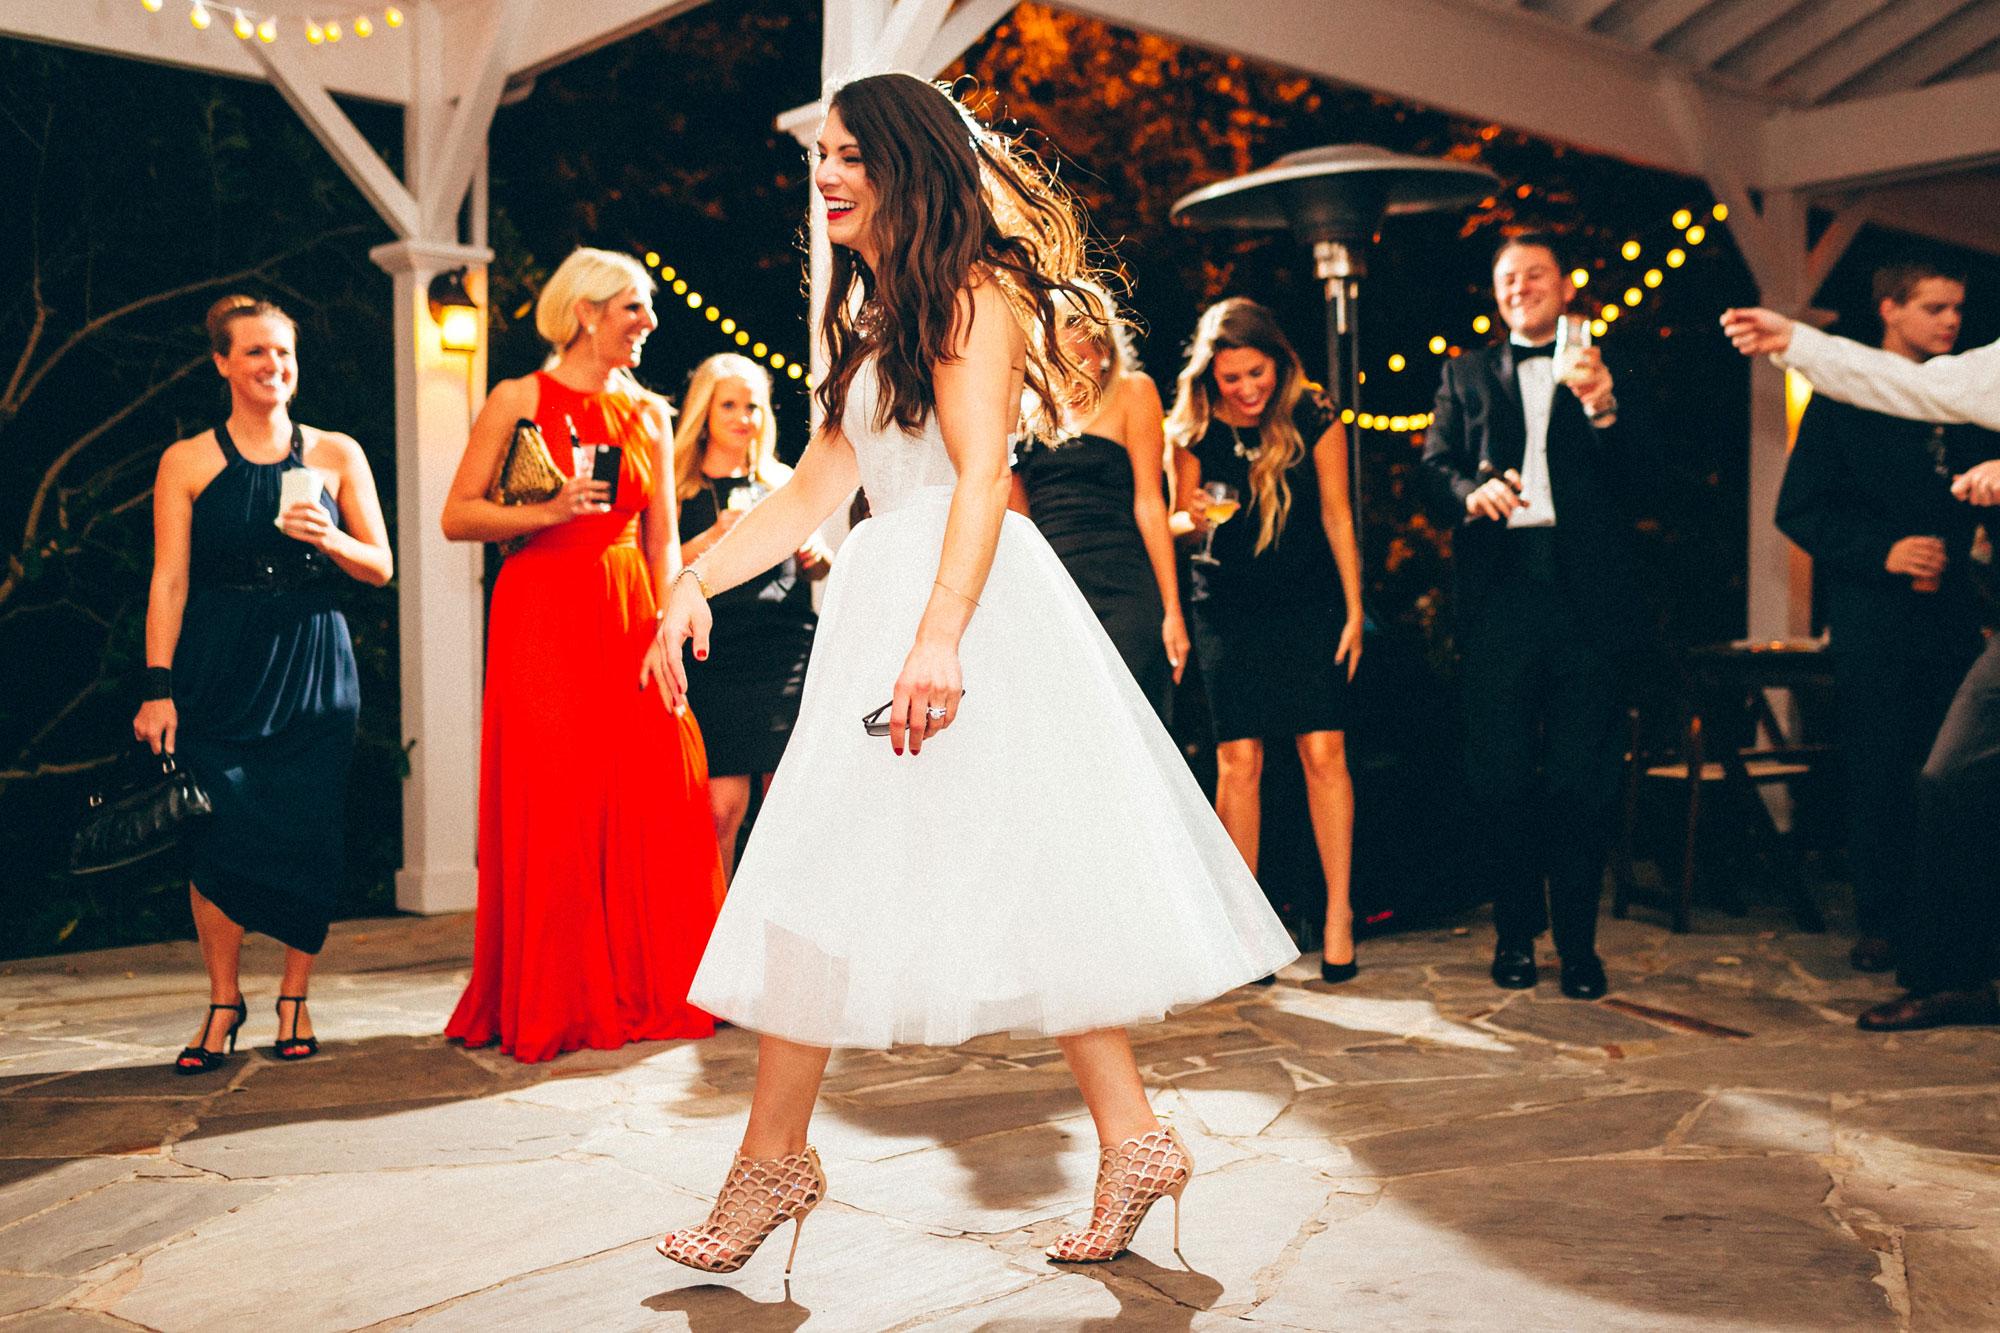 Me & Mr. Jones Wedding, Outdoor Reception at Cedarwood in Nashville, Bride Wearing MAC 'Ruby Woo' Lipstick, Watters Carina Corset, Space 46 Tulle Skirt, Sergio Rossi Mermaid Booties